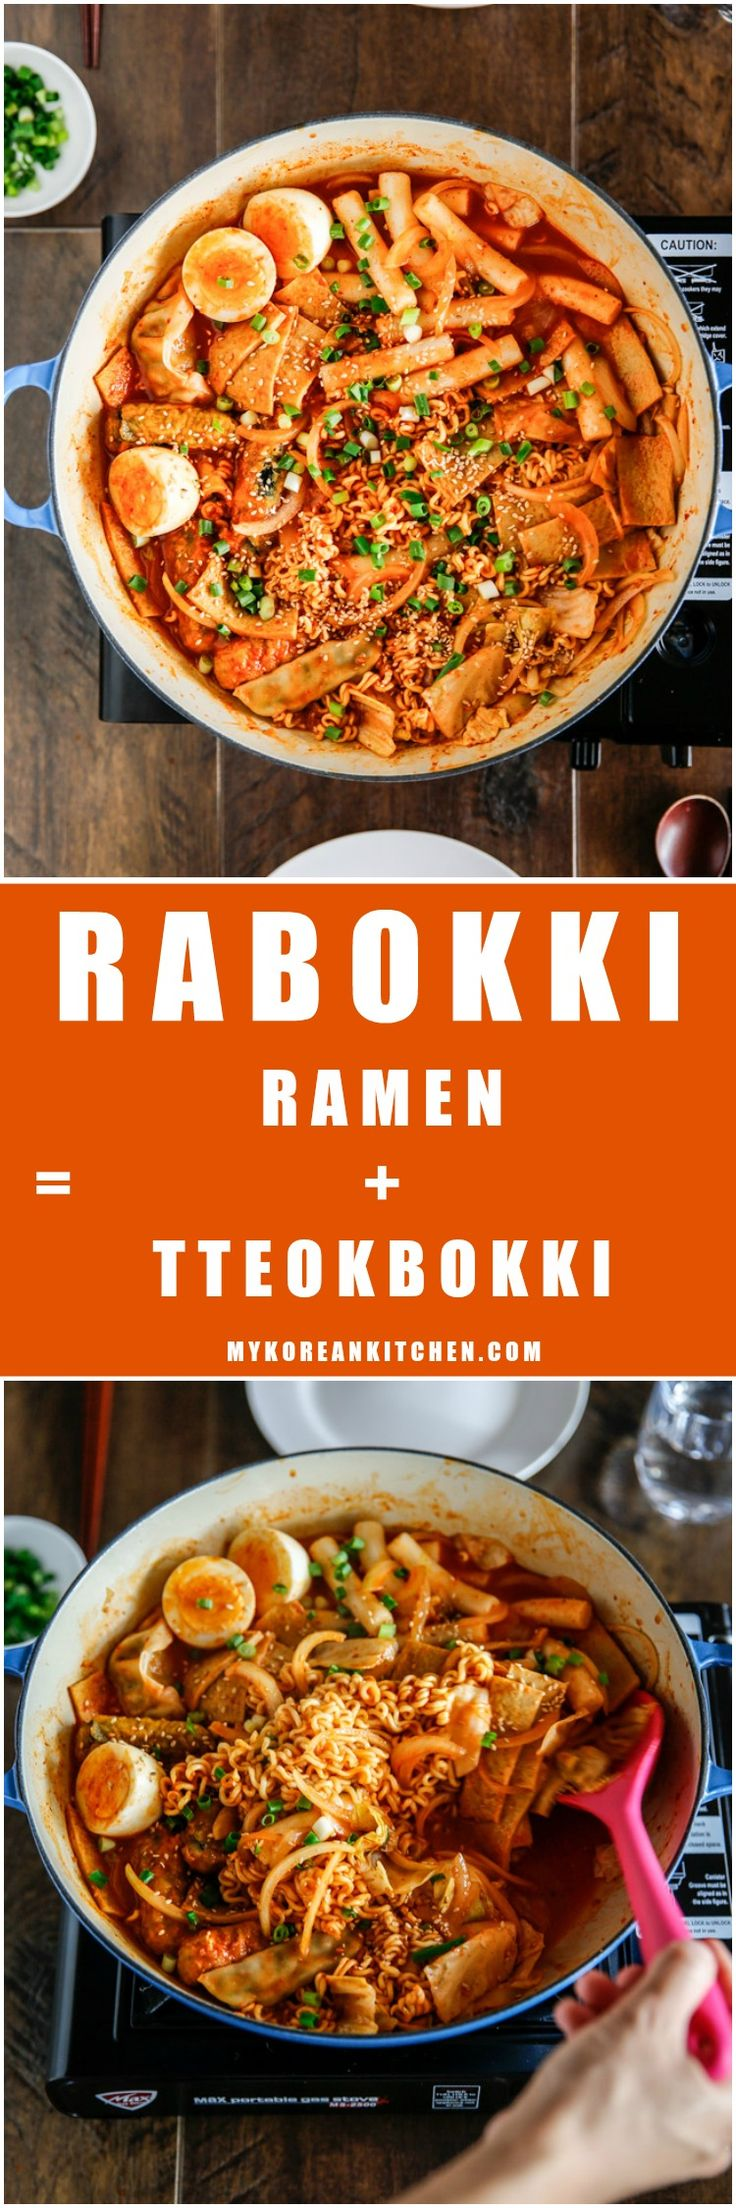 Rabokki - Instant Ramen Noodles + Tteokbokki (Korean spicy rice cakes)   MyKoreanKitchen.com